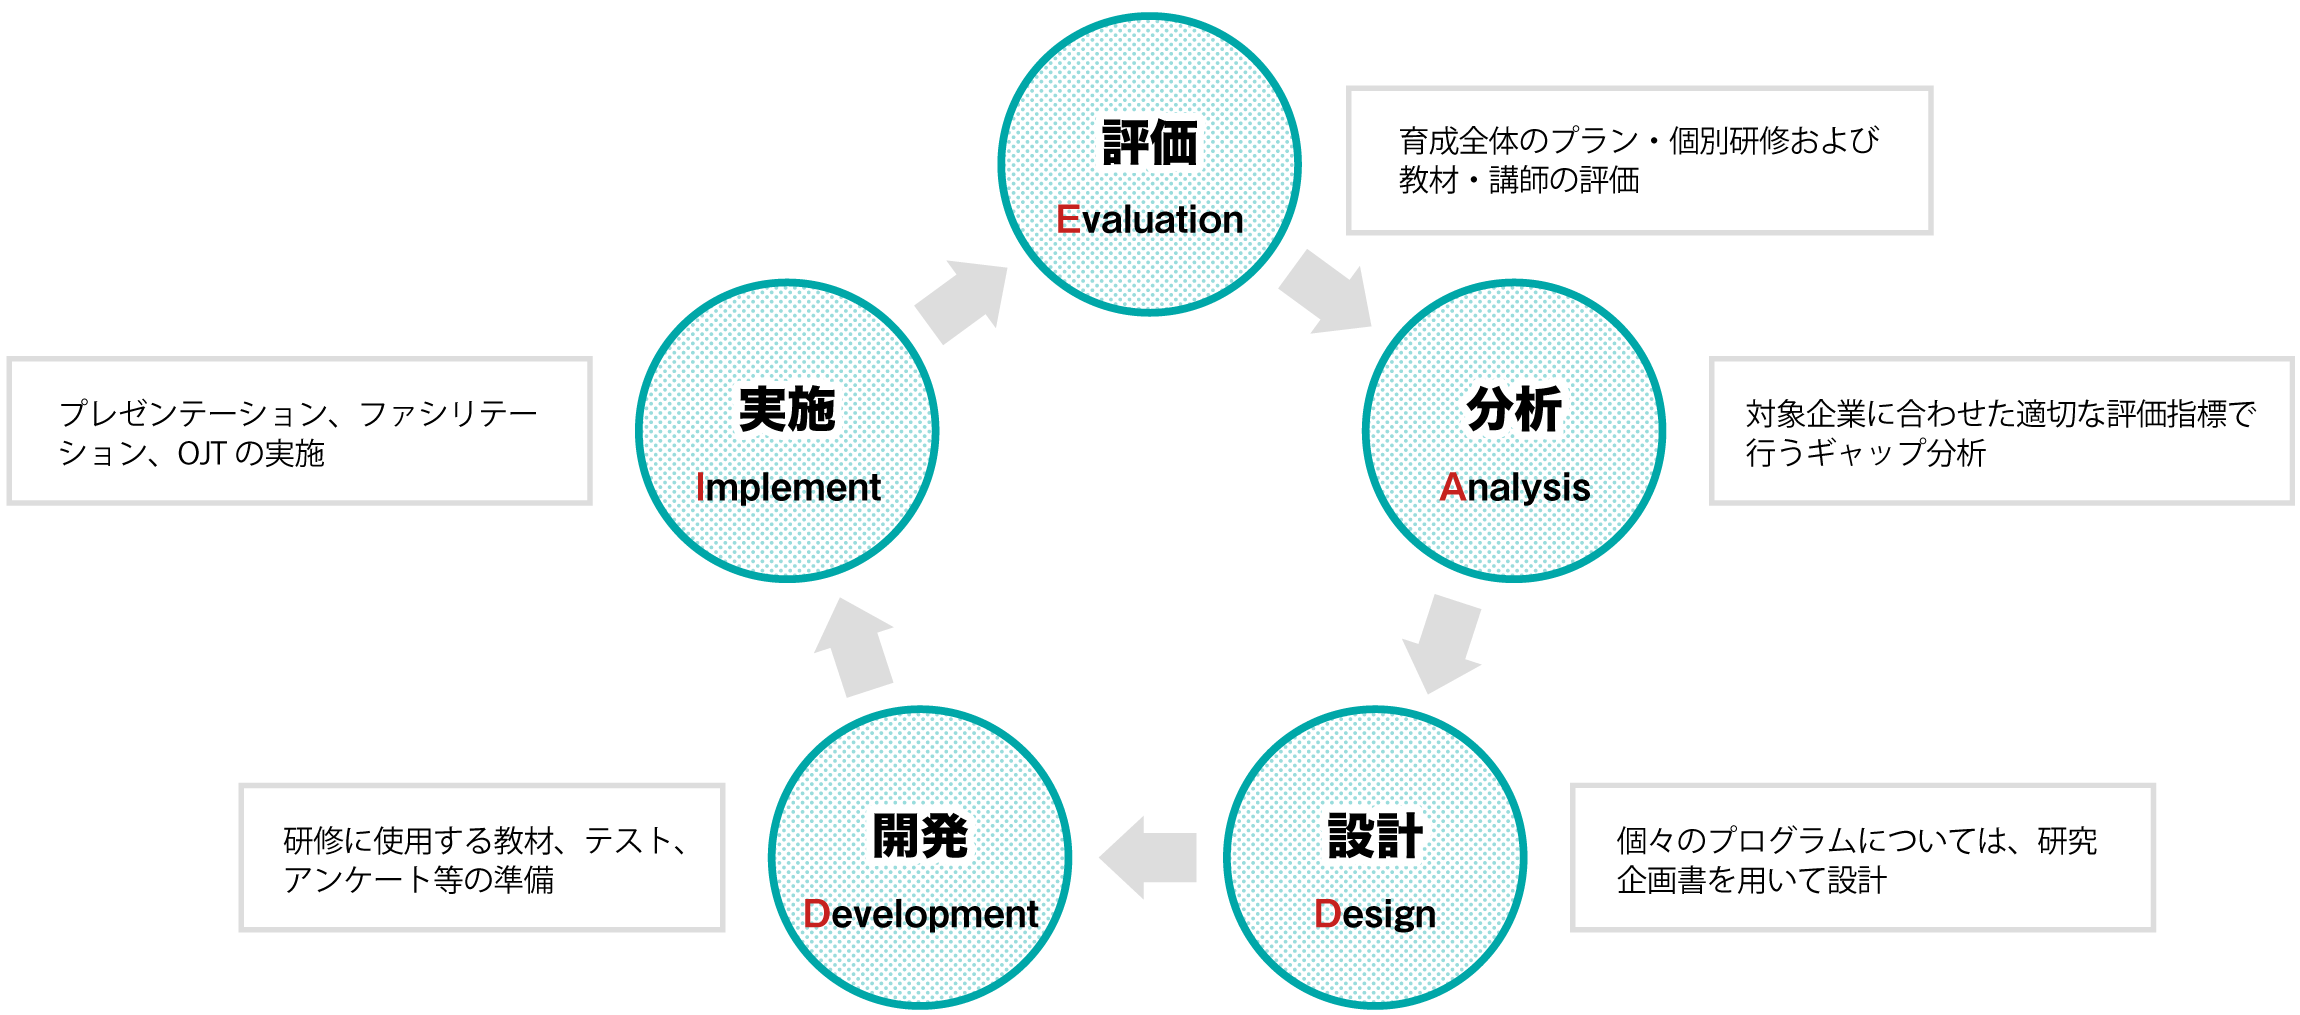 ■ADDIEモデル 評価(育成全体のプラン・個別研修および教材・講師の評価)→分析(対象企業に合わせた適切な評価指標で行うギャップ分析)→設計(個々のプログラムについては、研究企画書を用いて設計)→開発(研修に使用する教材、テスト、アンケート等の準備)→実施(プレゼンテーション、ファシリテーション、OJTの実施)→評価